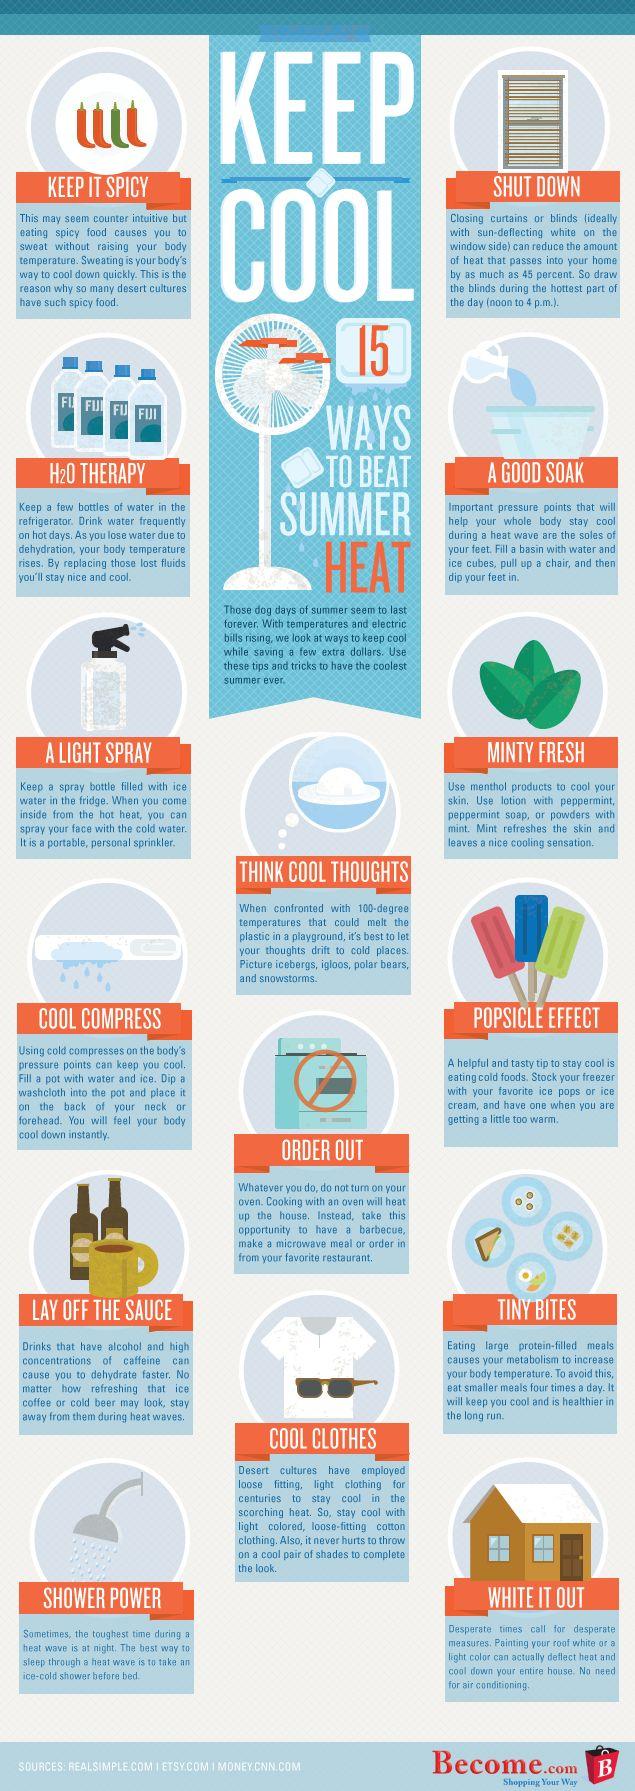 15 Ways to beat summer heat - Infographic